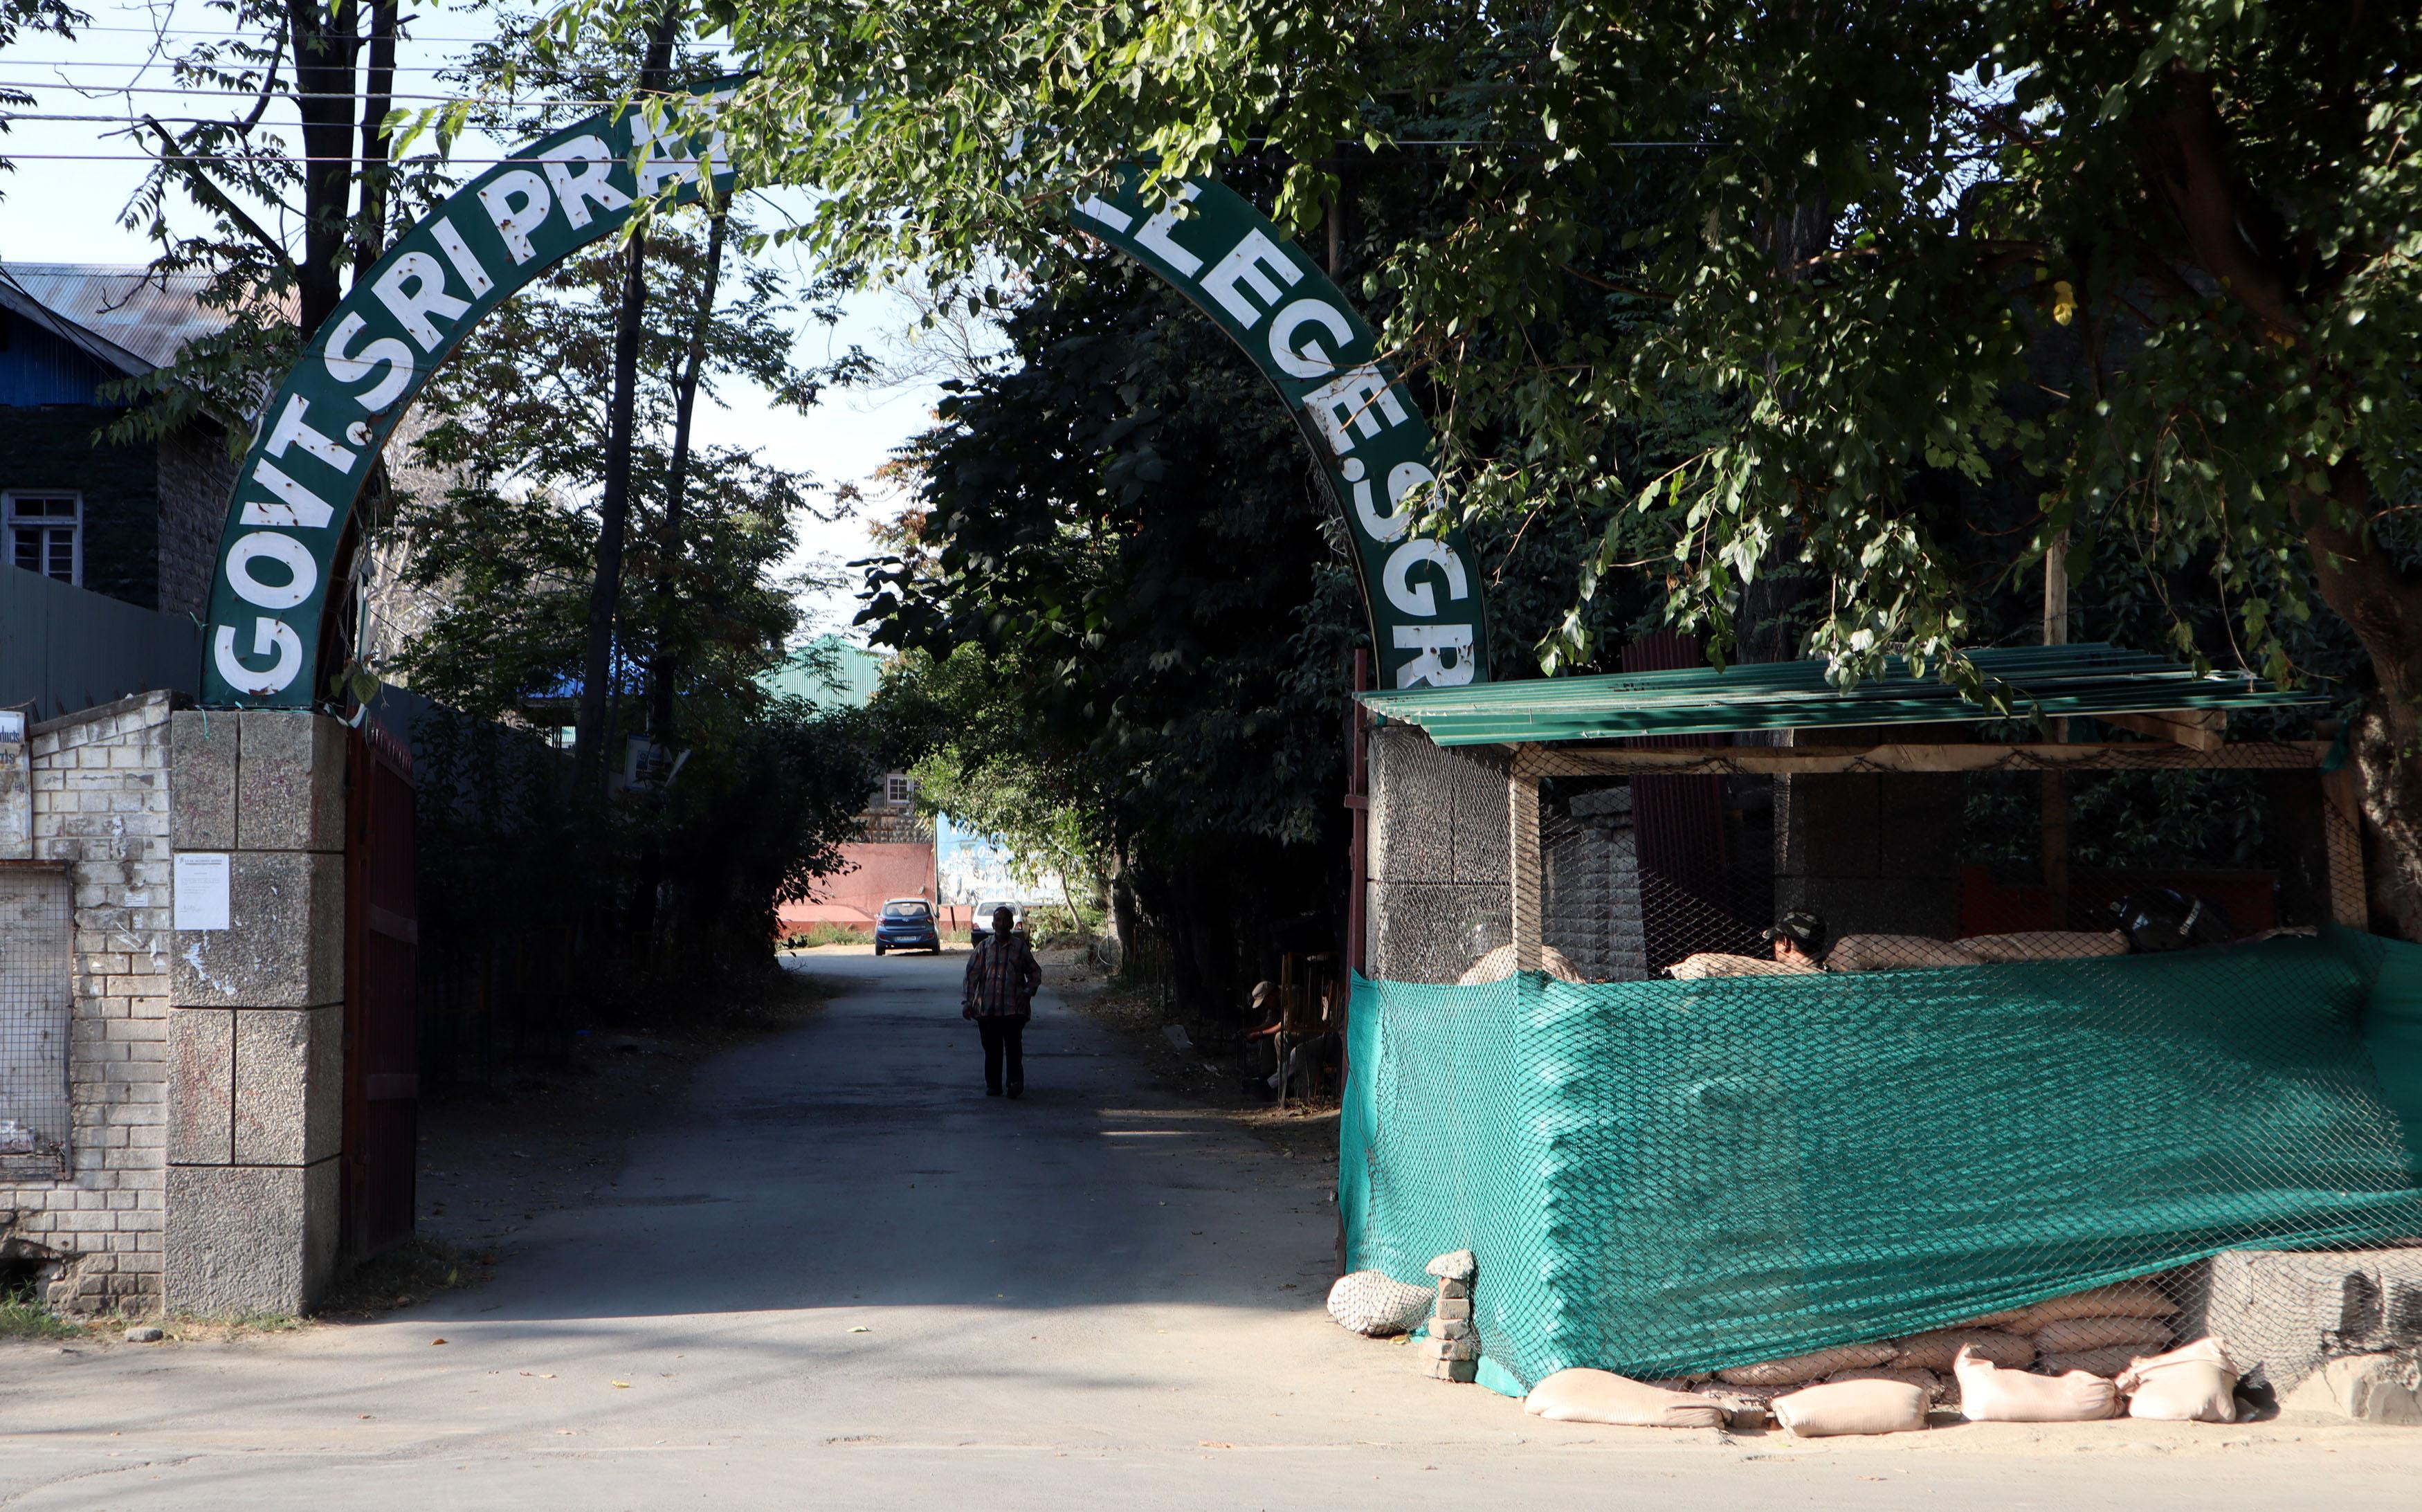 New bunker set up outside SP Collge in Srinagar city.